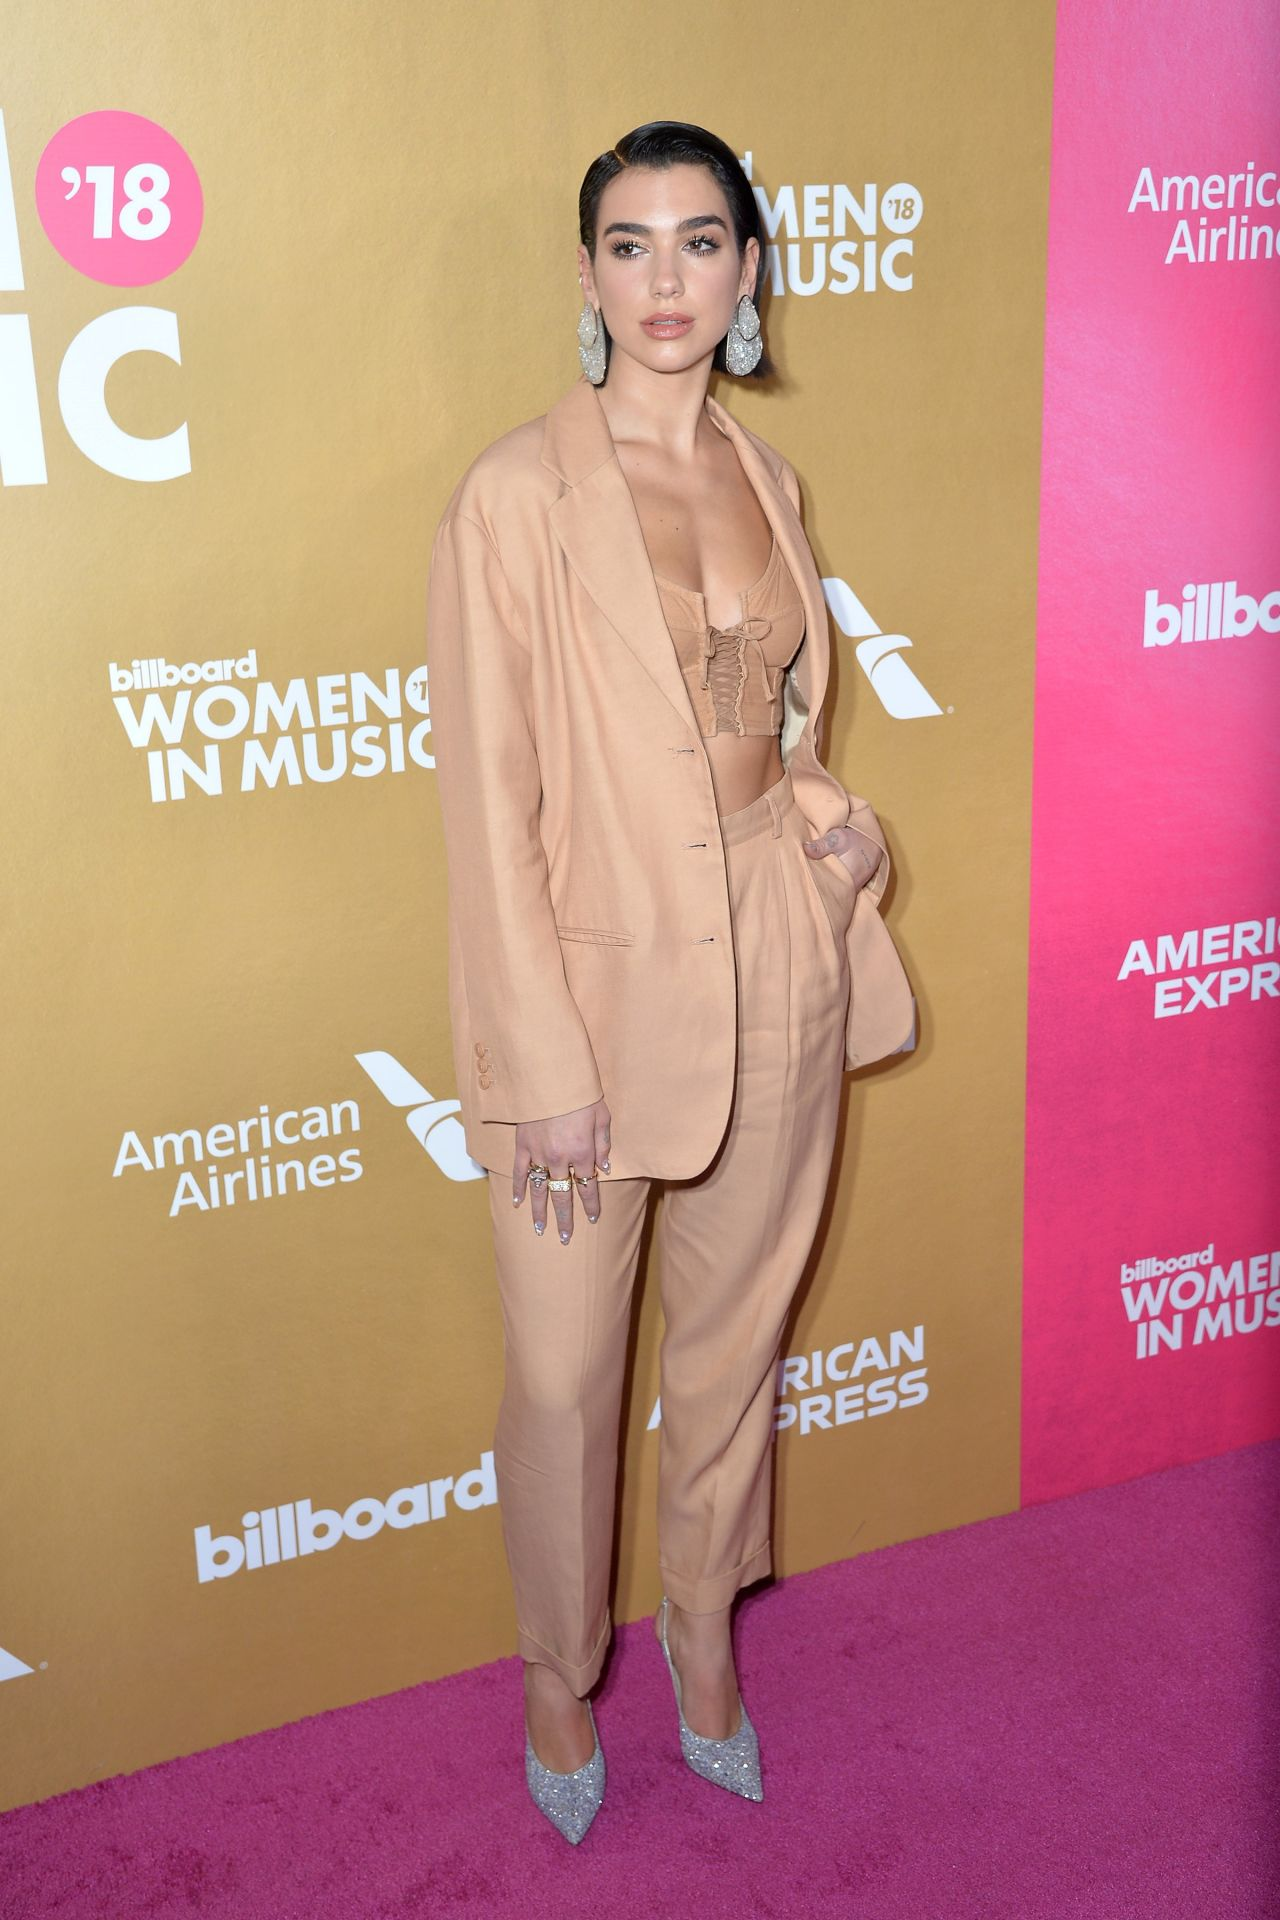 Pop Music: Top Pop Songs Chart | Billboard